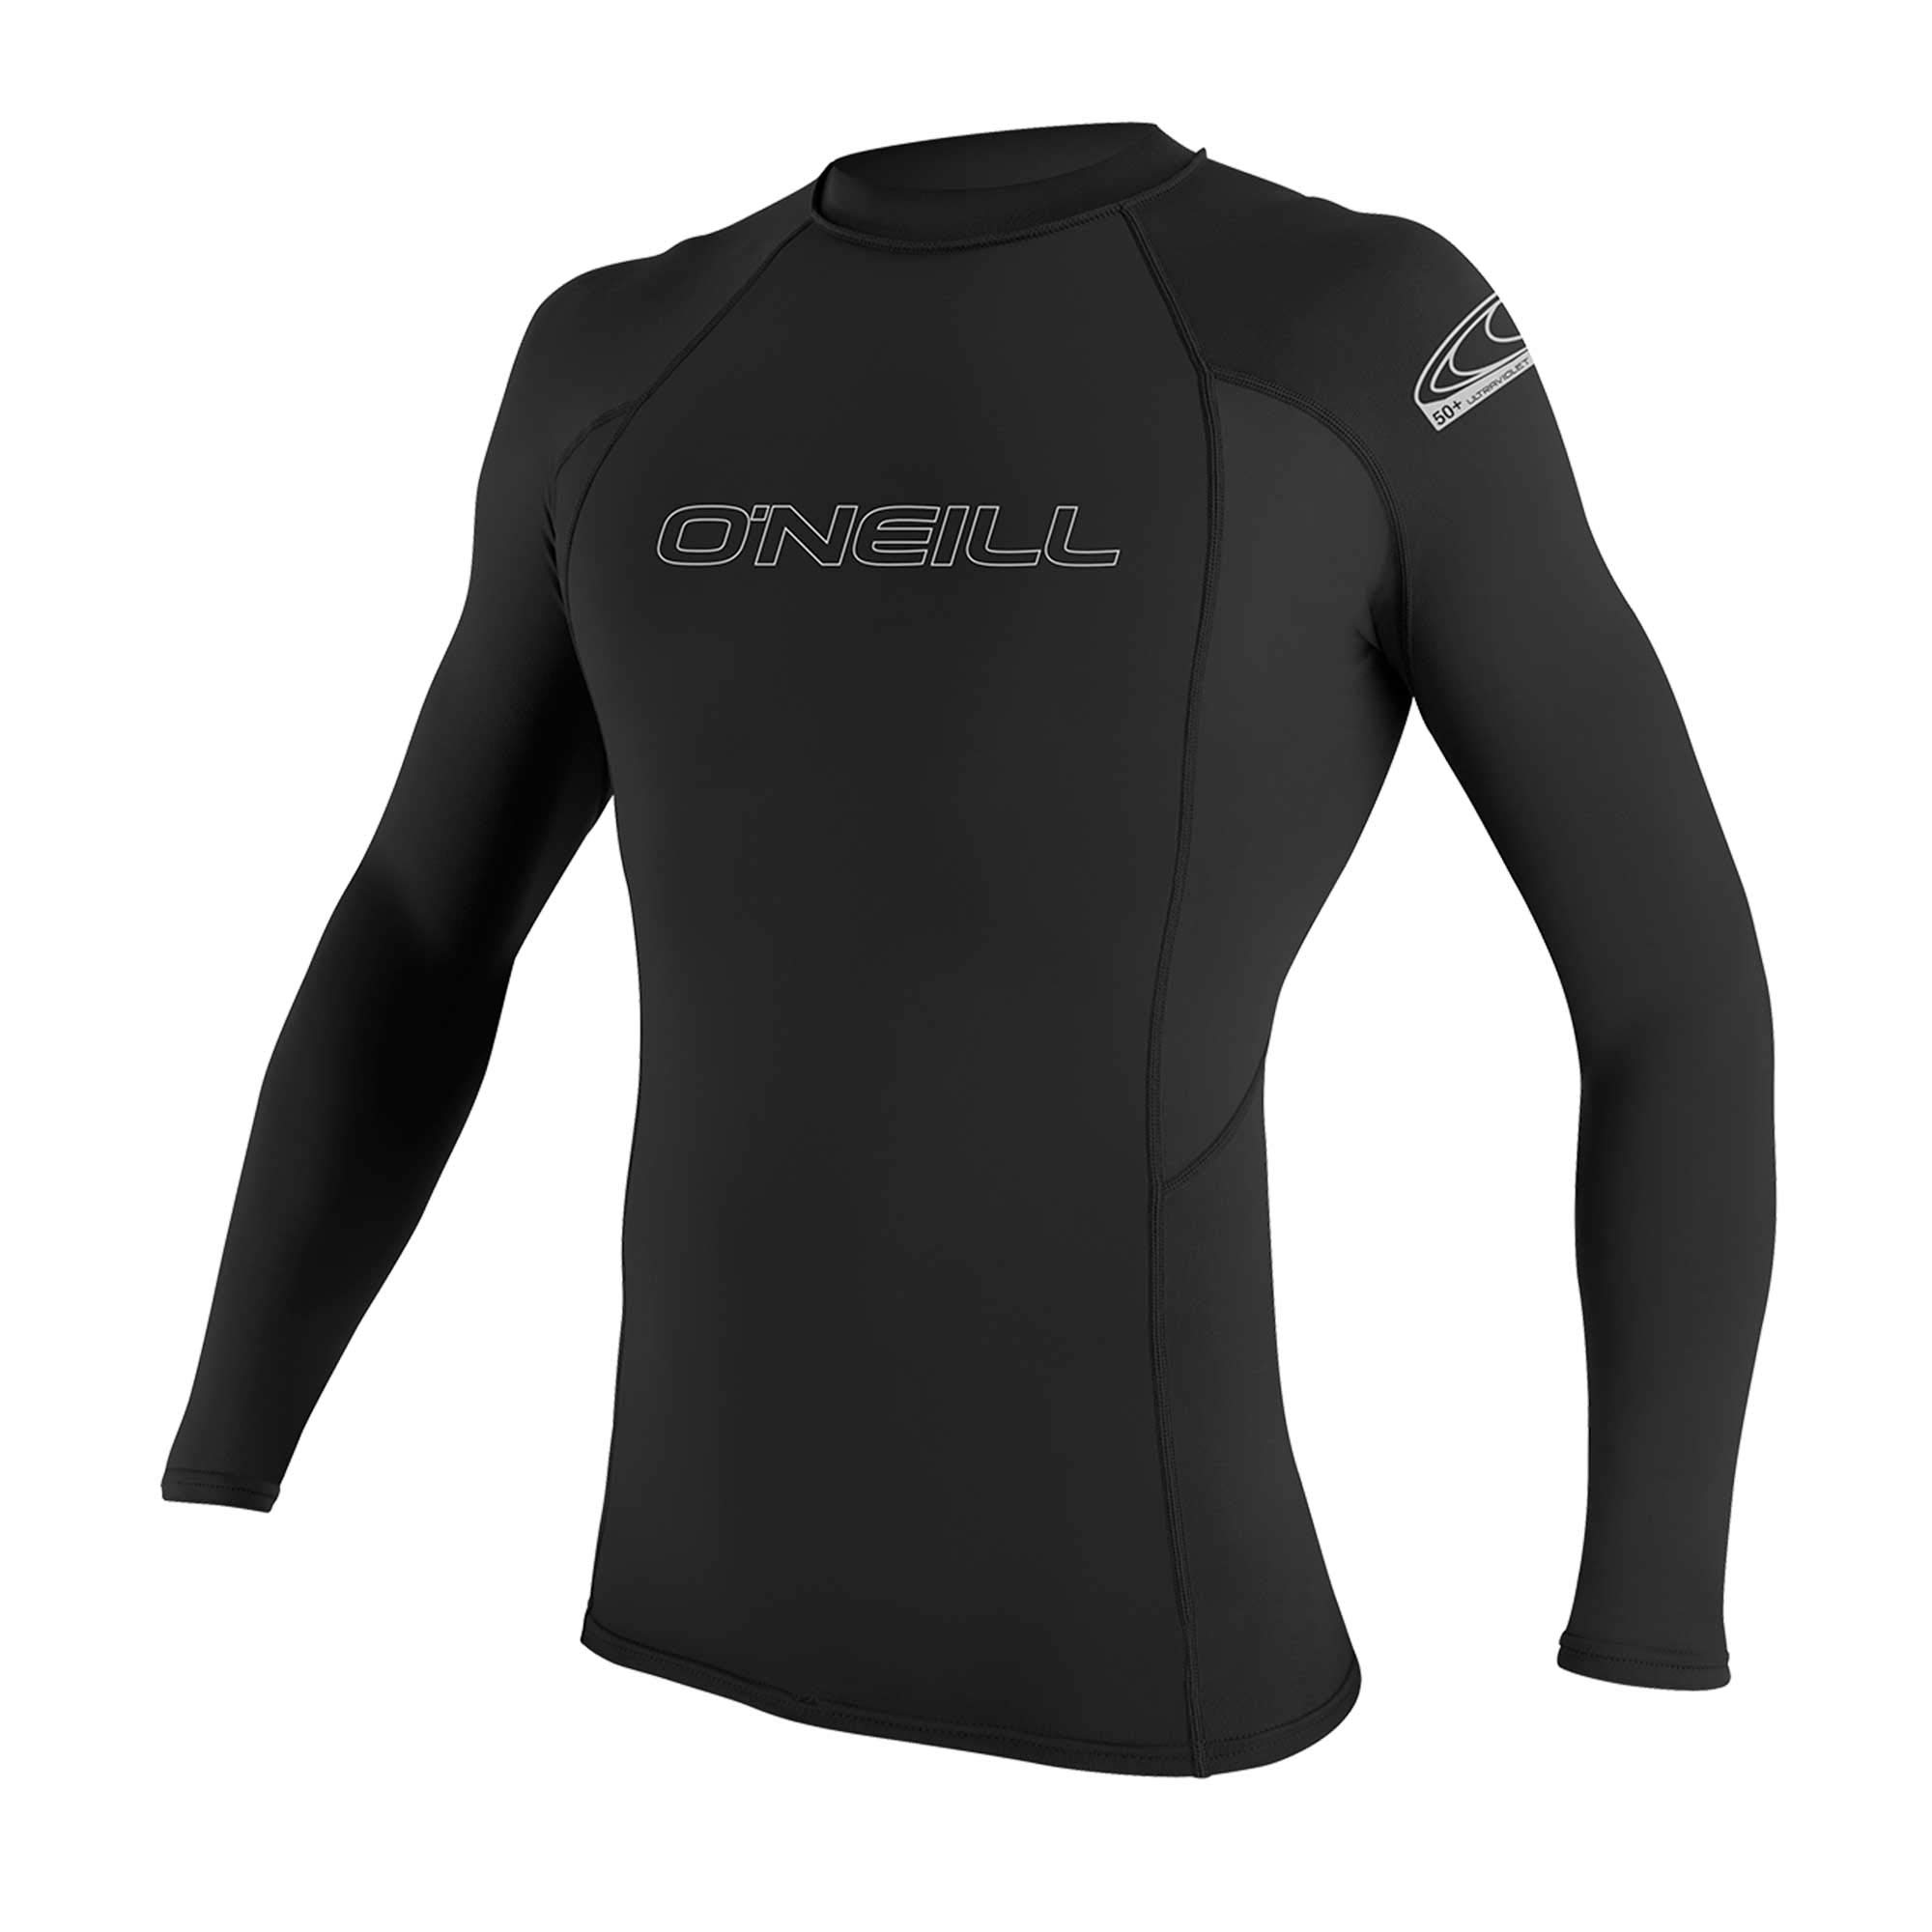 O'Neill Men's Basic Skins UPF 50+ Long Sleeve Rash Guard, Black, Small by O'Neill Wetsuits